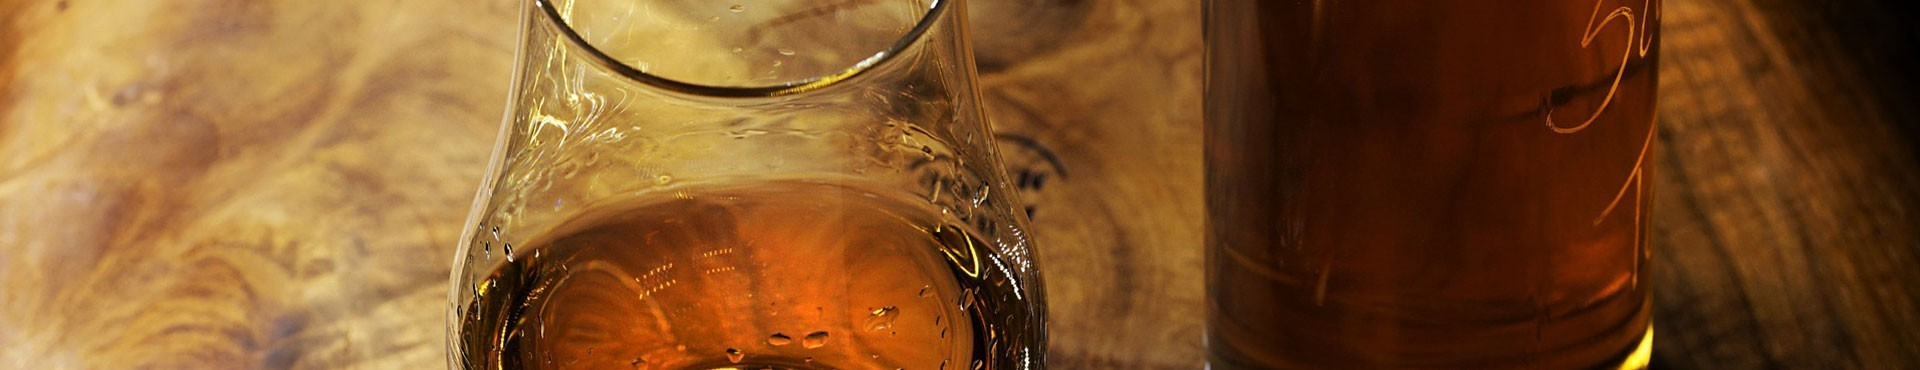 Nos Calvados - OnWine